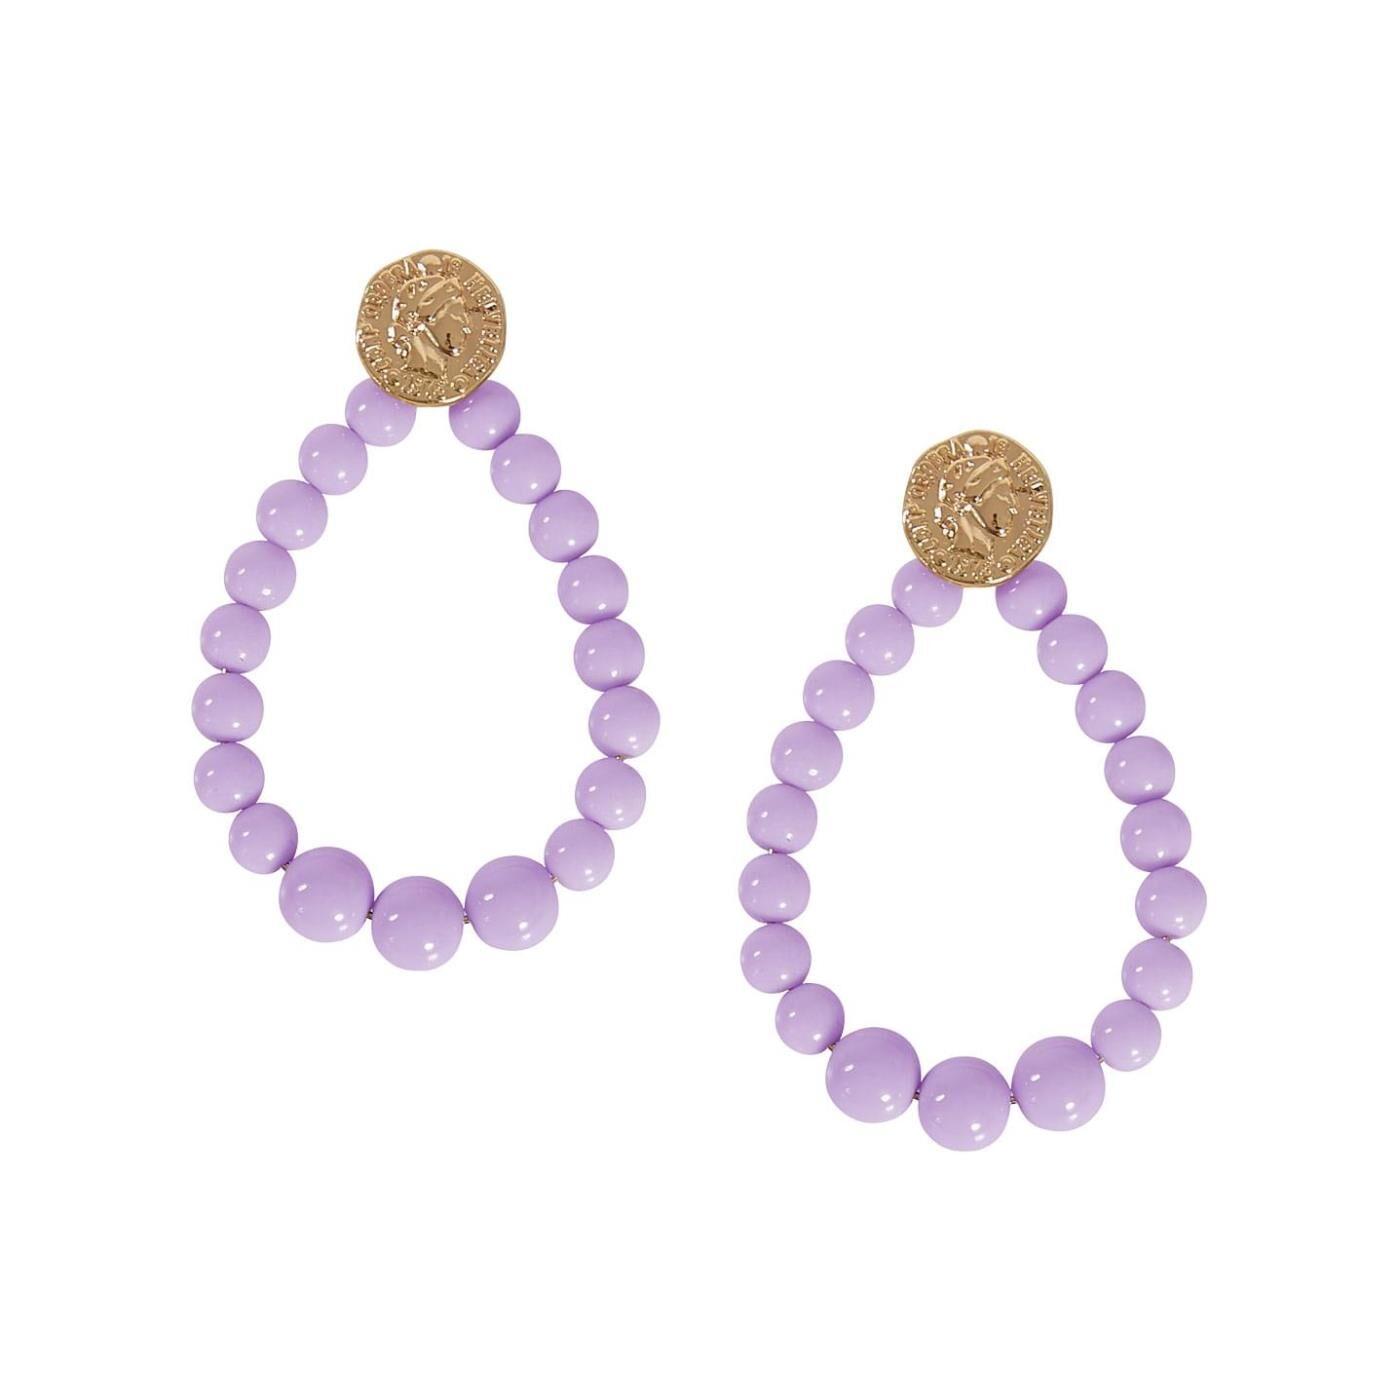 Celestino Κρεμαστά σκουλαρίκια με χάντρες  - Λιλα - Grootte: One Size